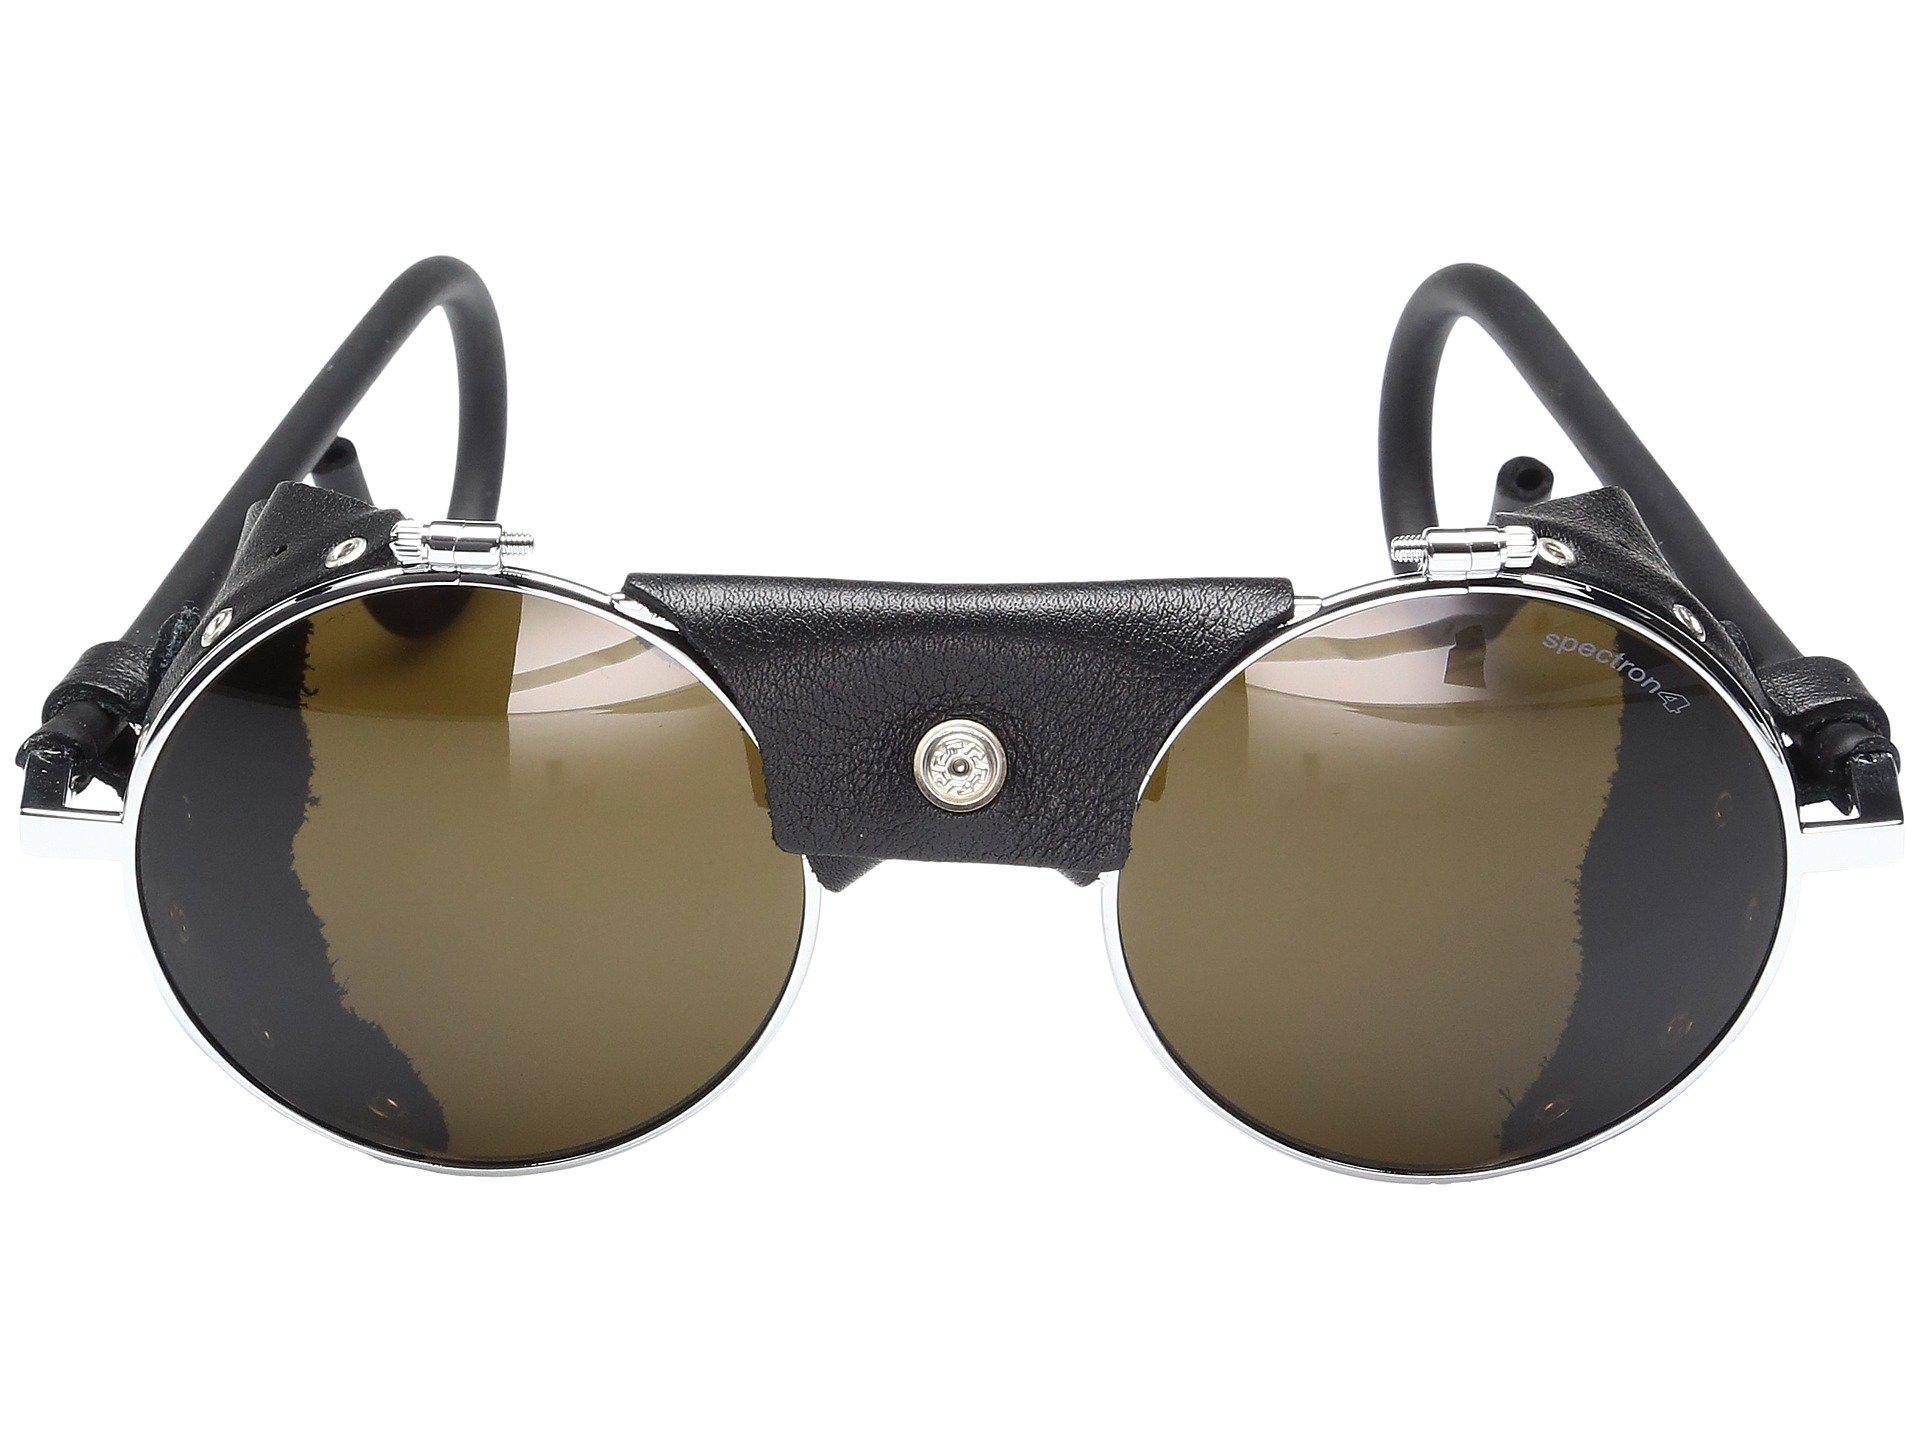 7cfeebbff4c ... Julbo Vermont Mountain Sunglass (black With Spectron 4 Lens) Fashion  Sunglasses. View fullscreen